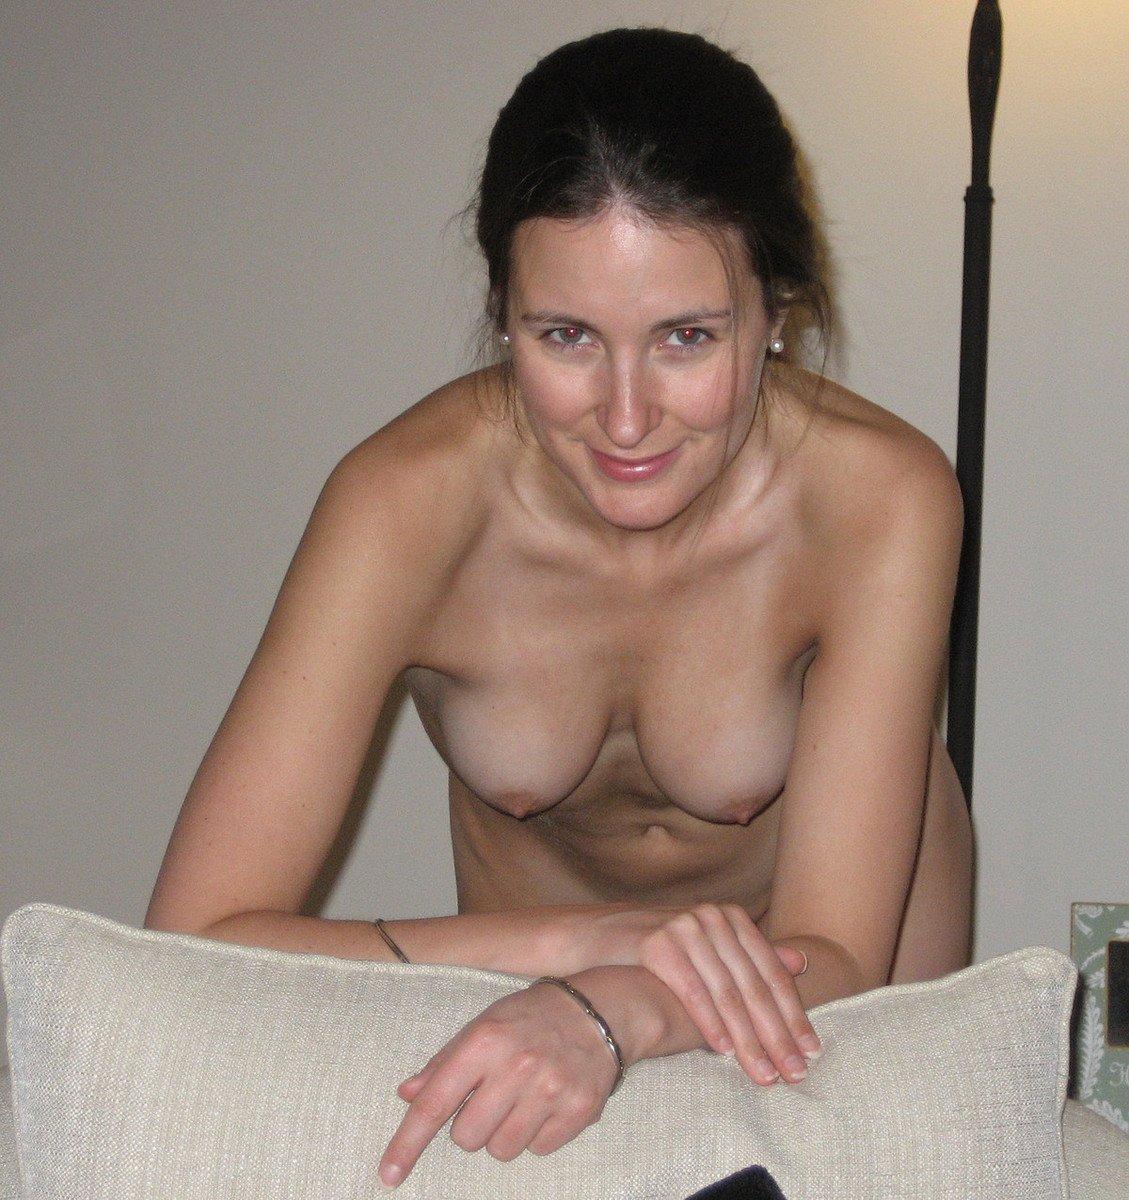 Anal porno escort girl rosny